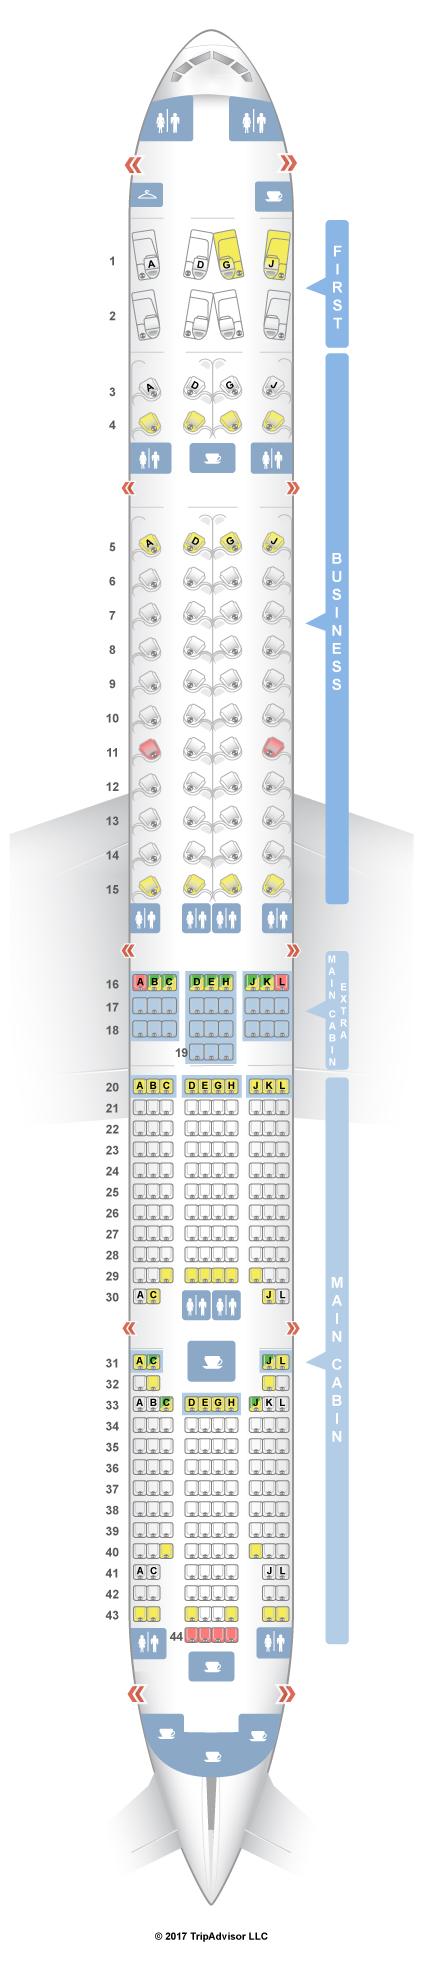 SeatGuru Seat Map American Airlines Boeing ER W - Us airways location map